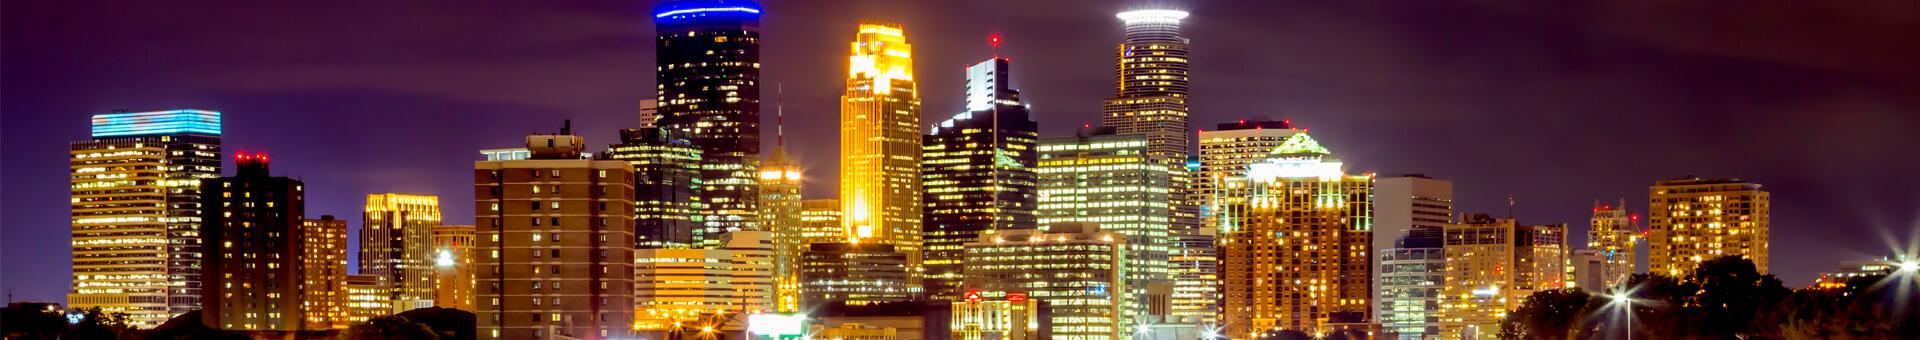 MSP, MN cityscape